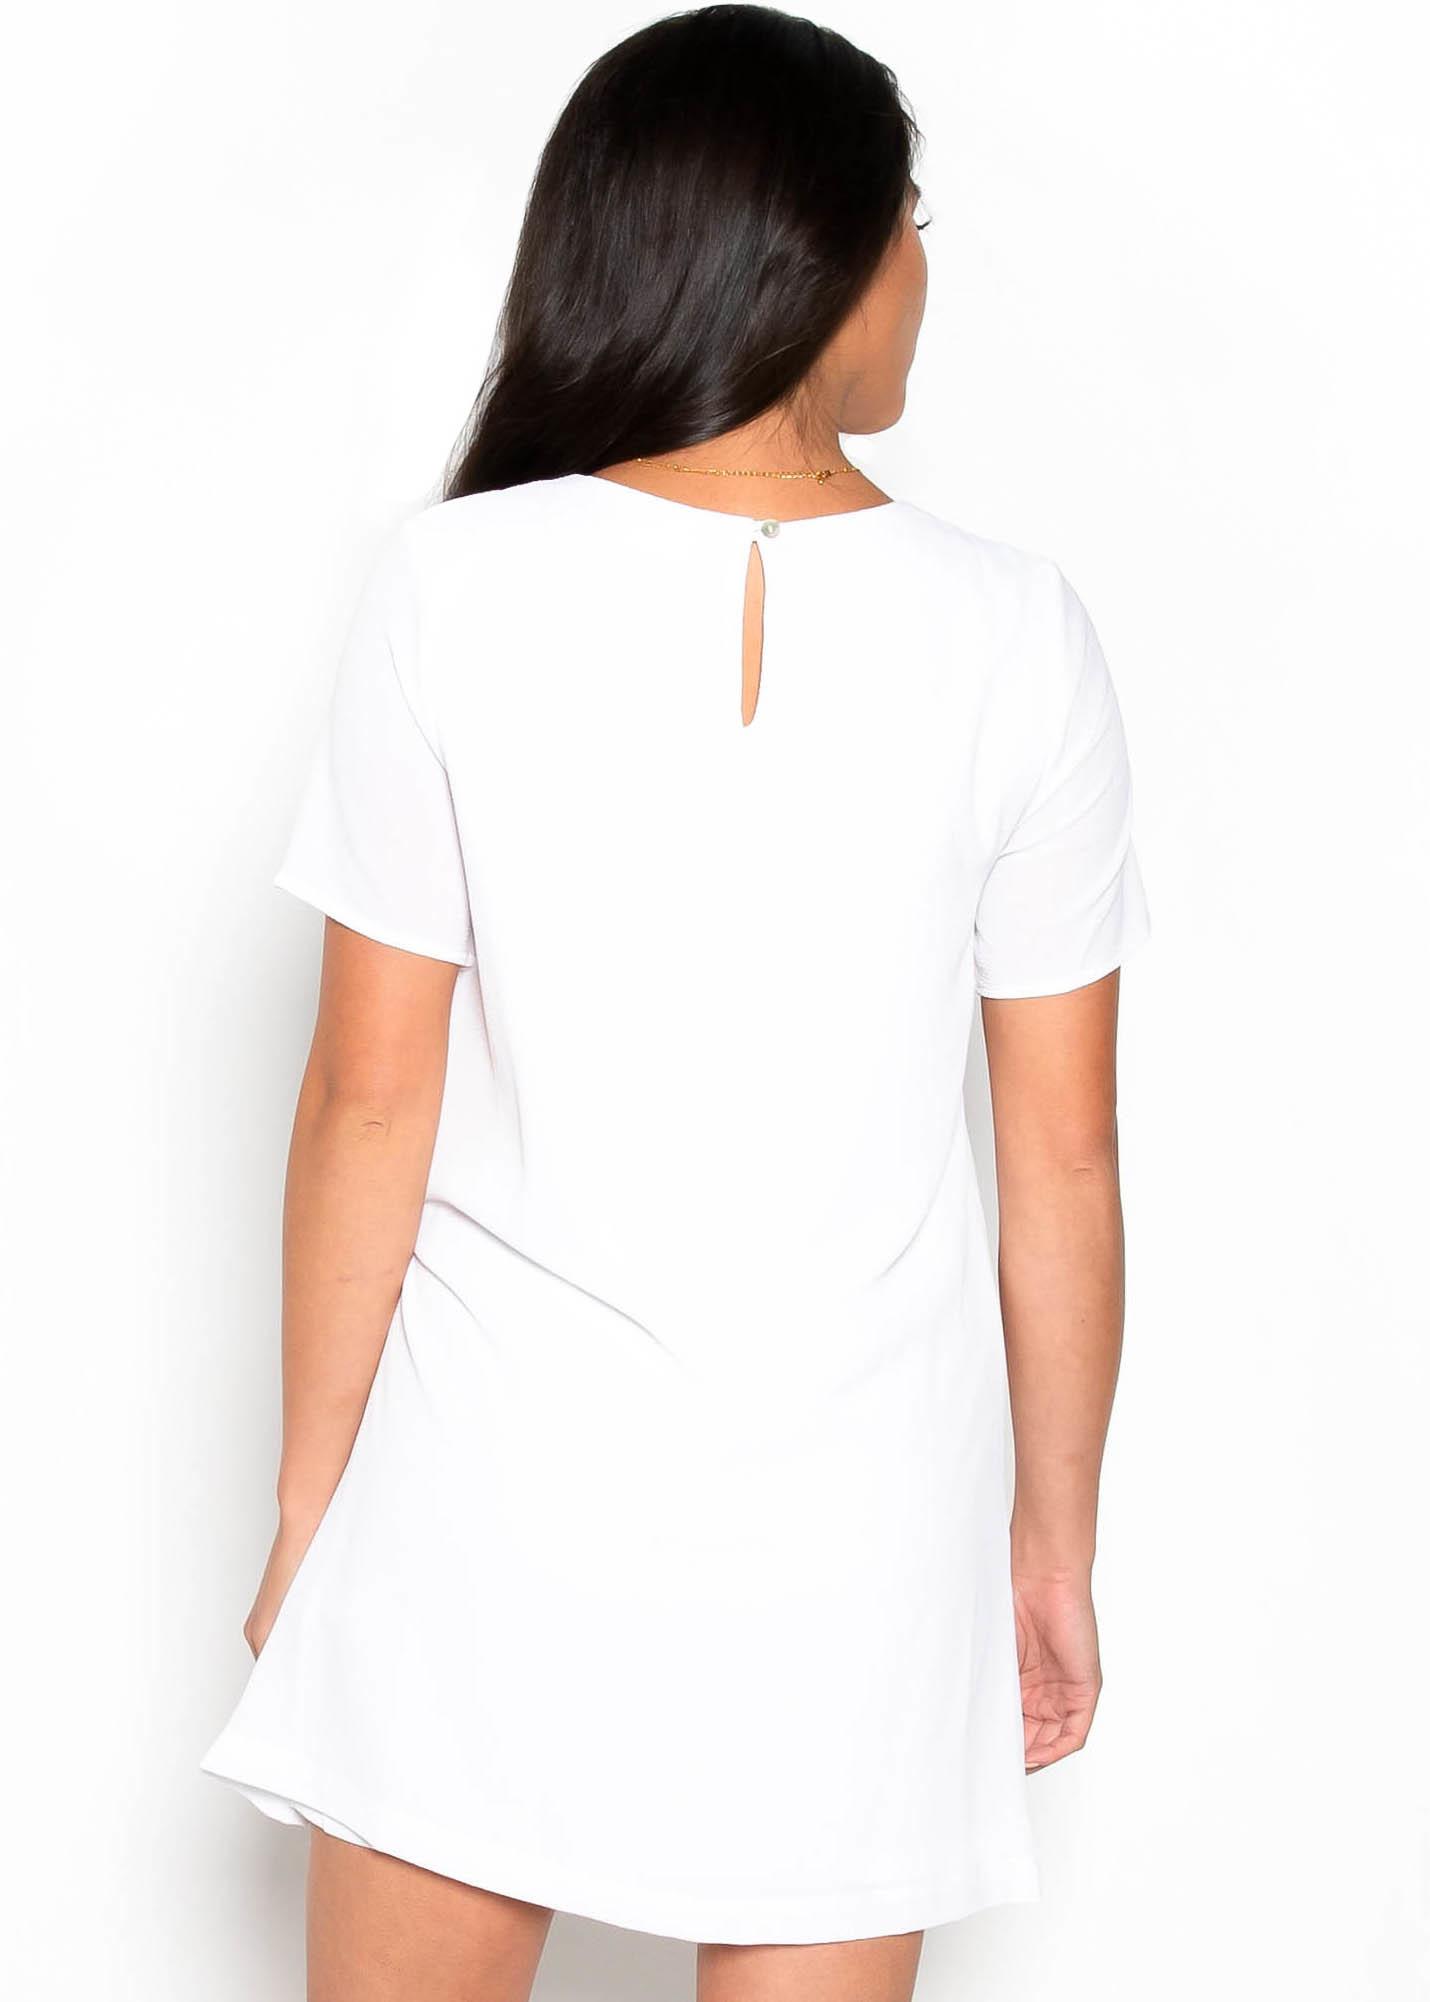 RAISE A GLASS WHITE DRESS